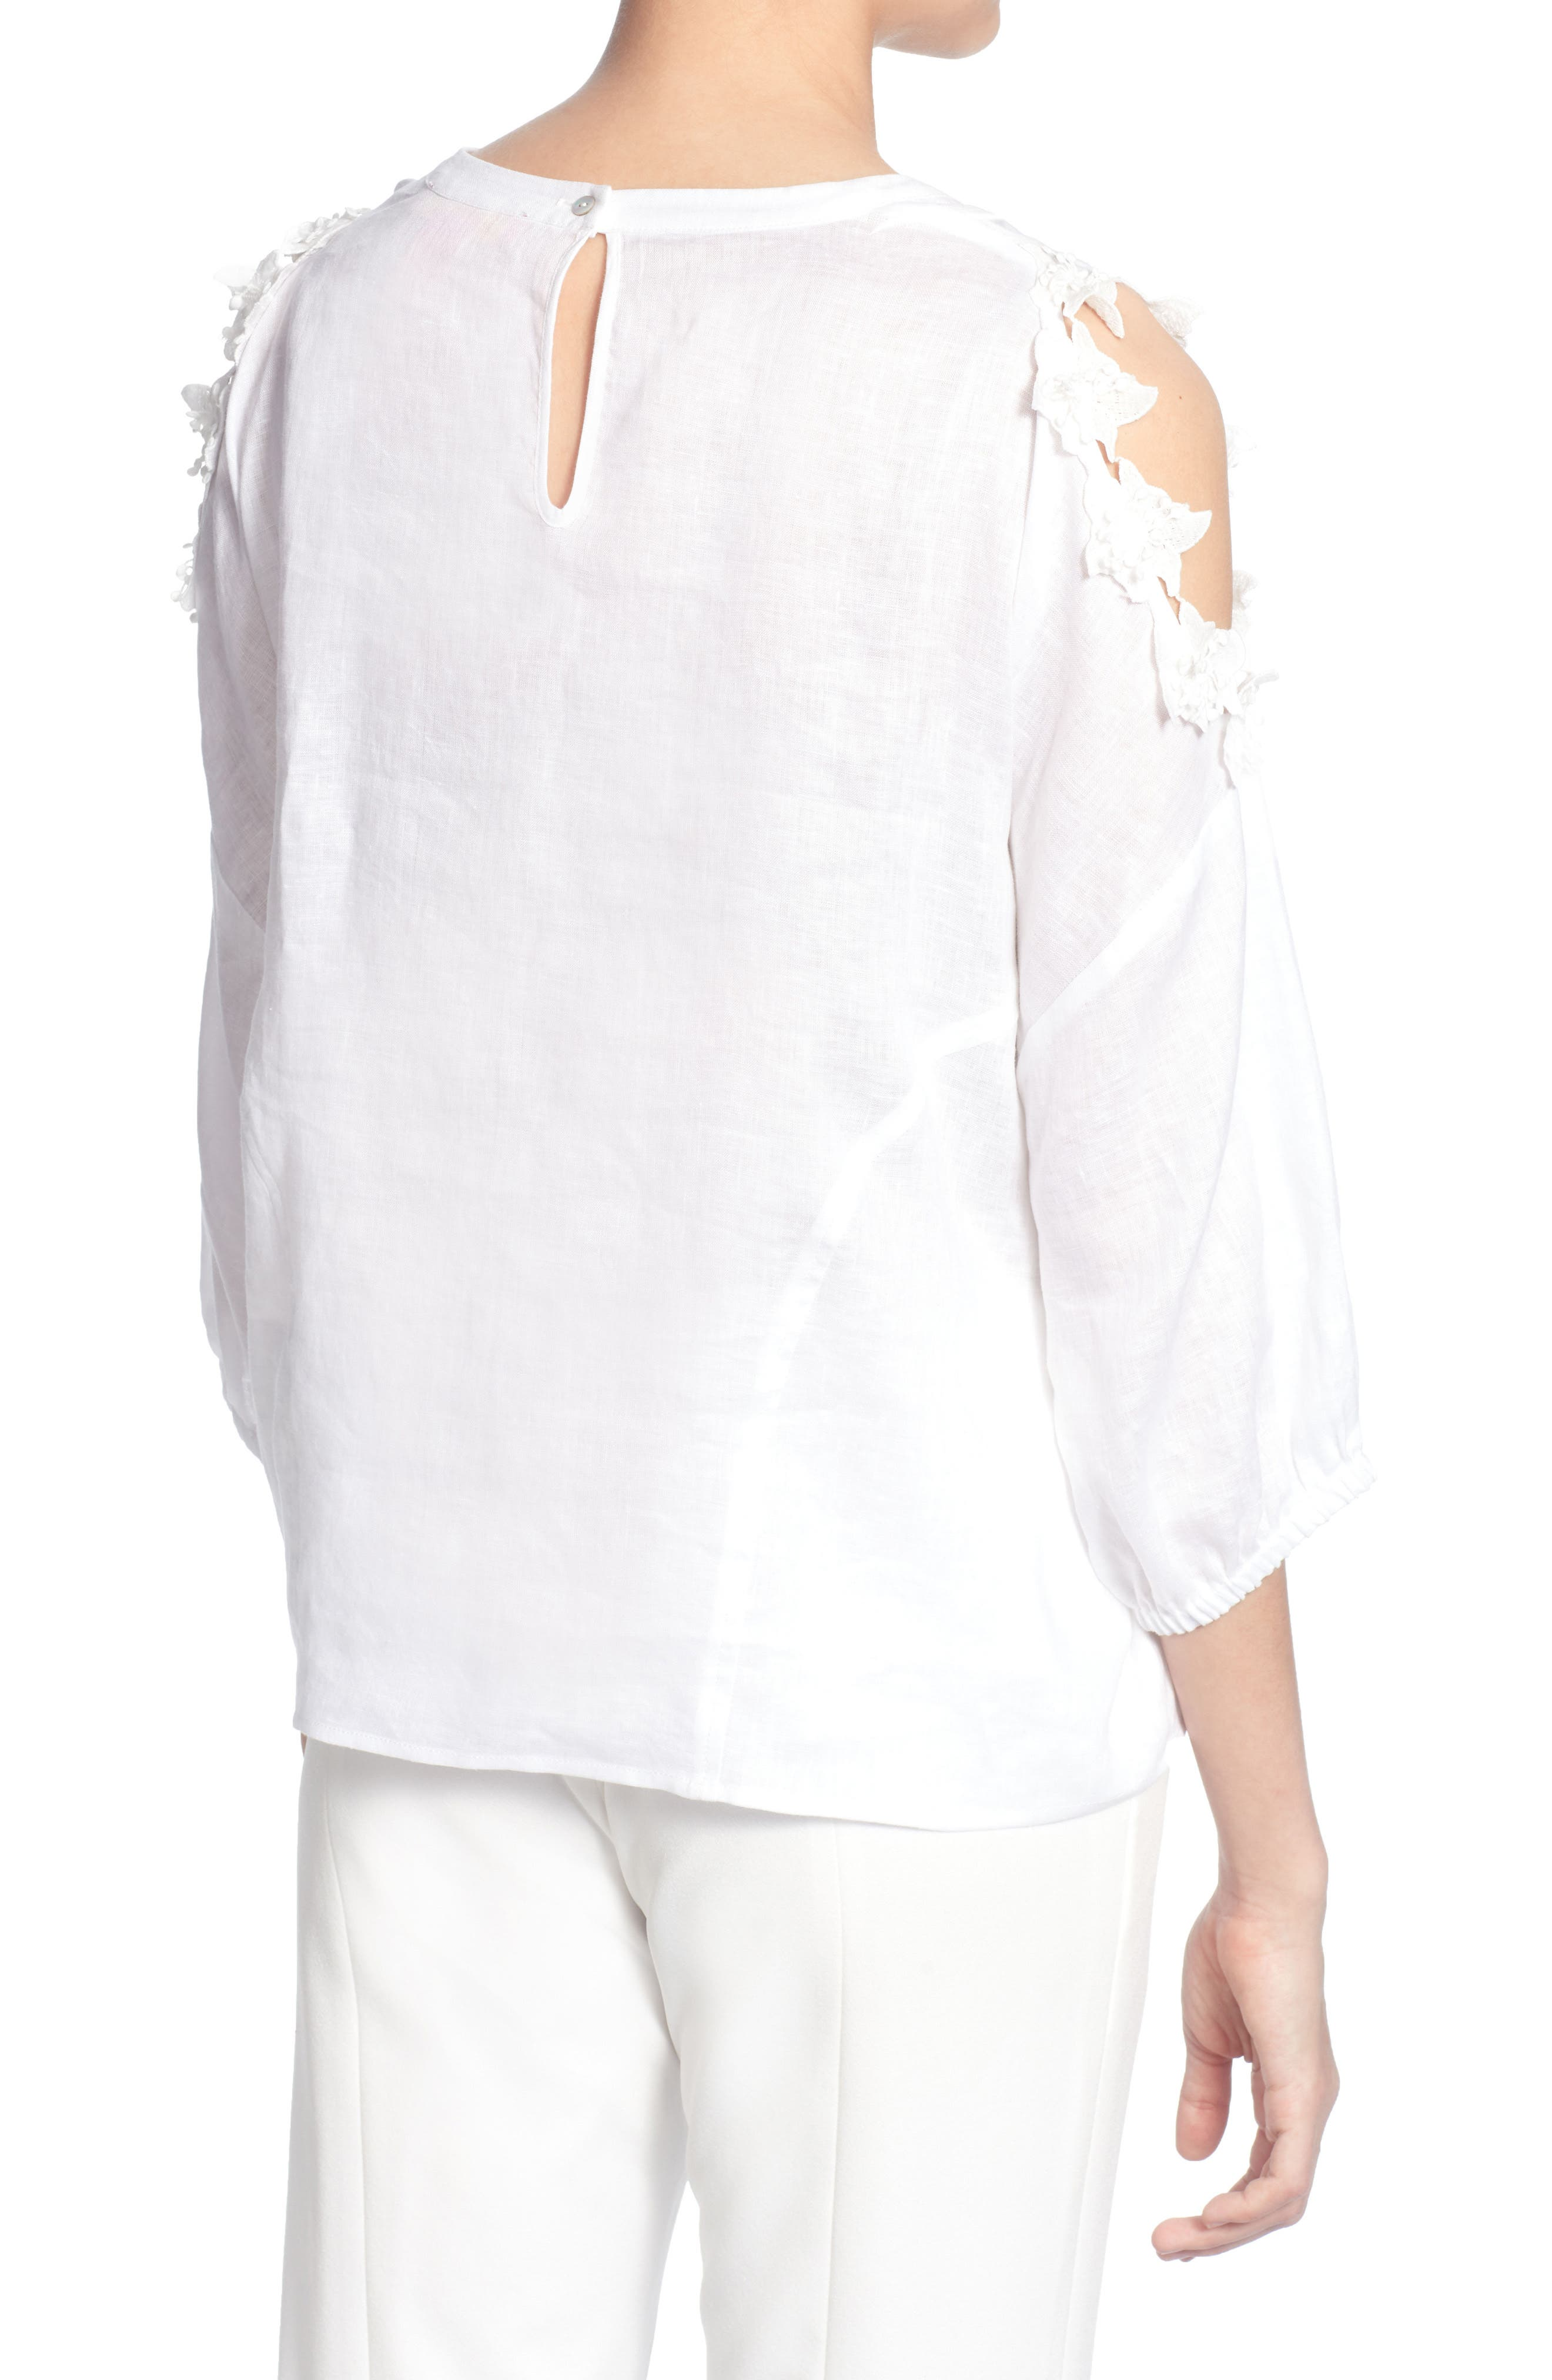 Priya Cold Shoulder Top,                             Alternate thumbnail 2, color,                             Bright White